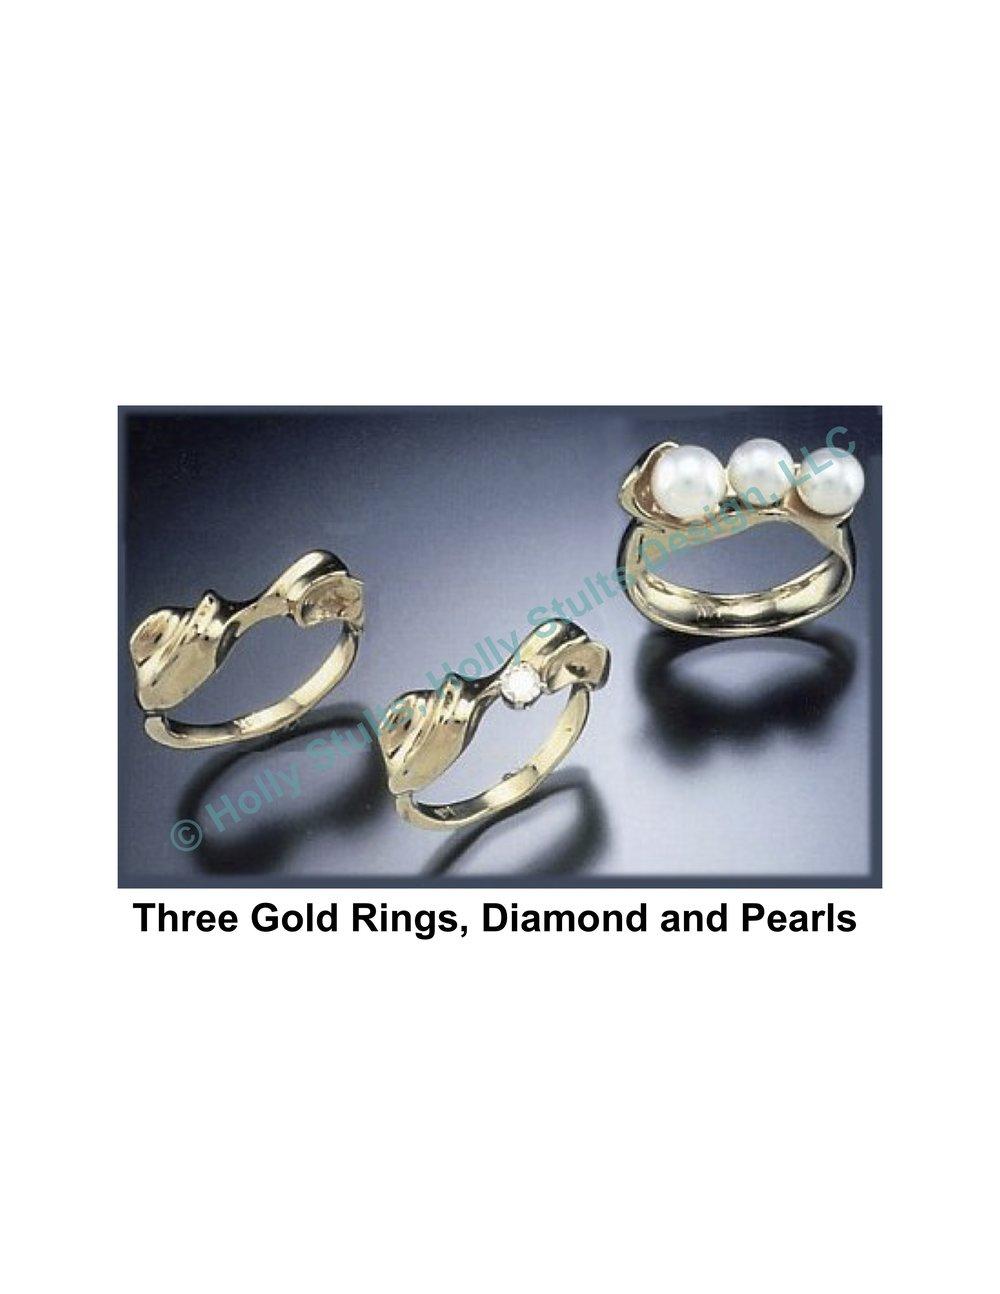 Three Gold Rings, Diamond and Pearls.jpg